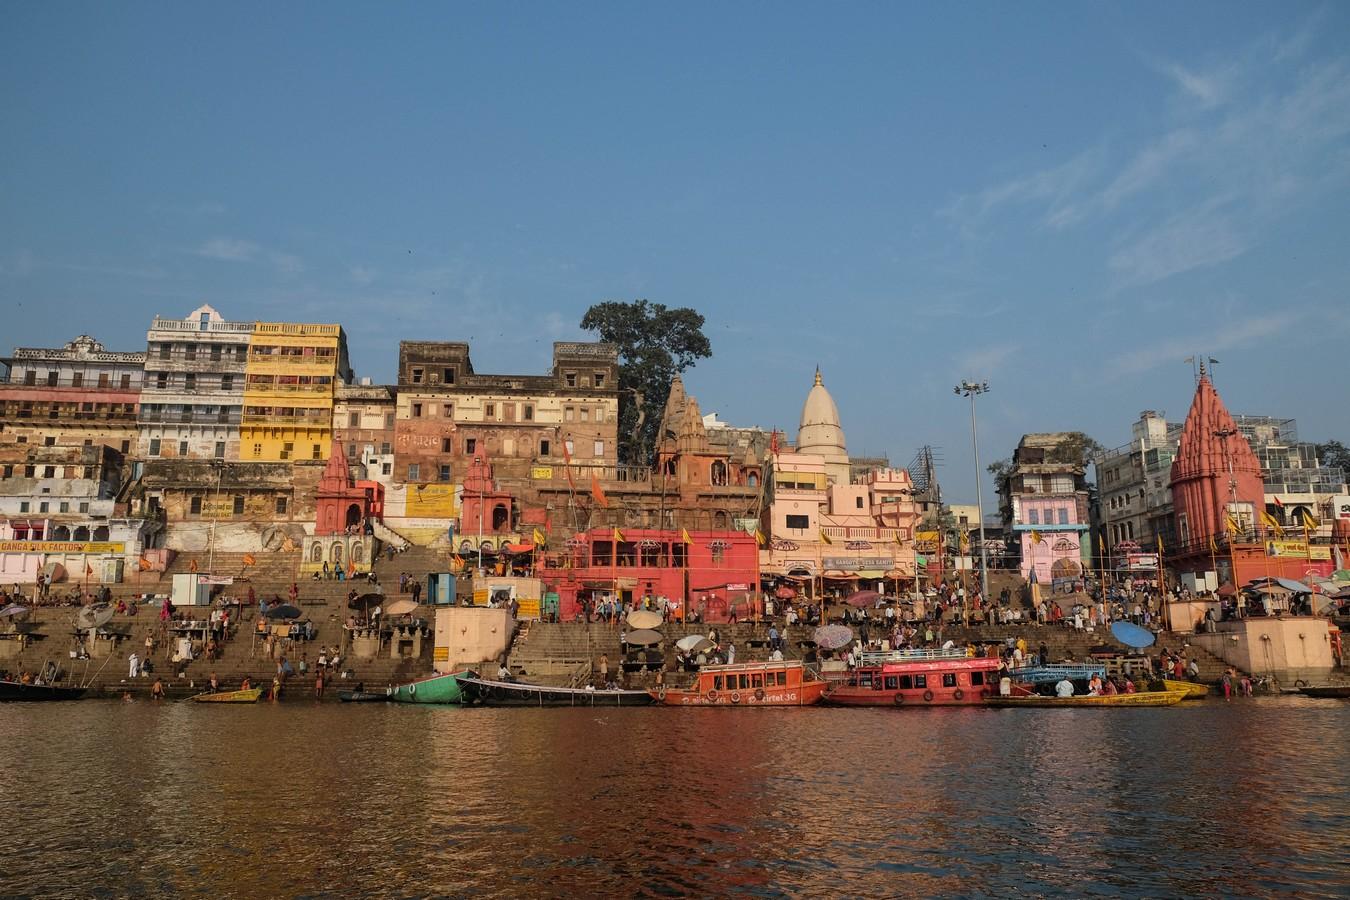 Vue sur Varanasi depuis le Gange